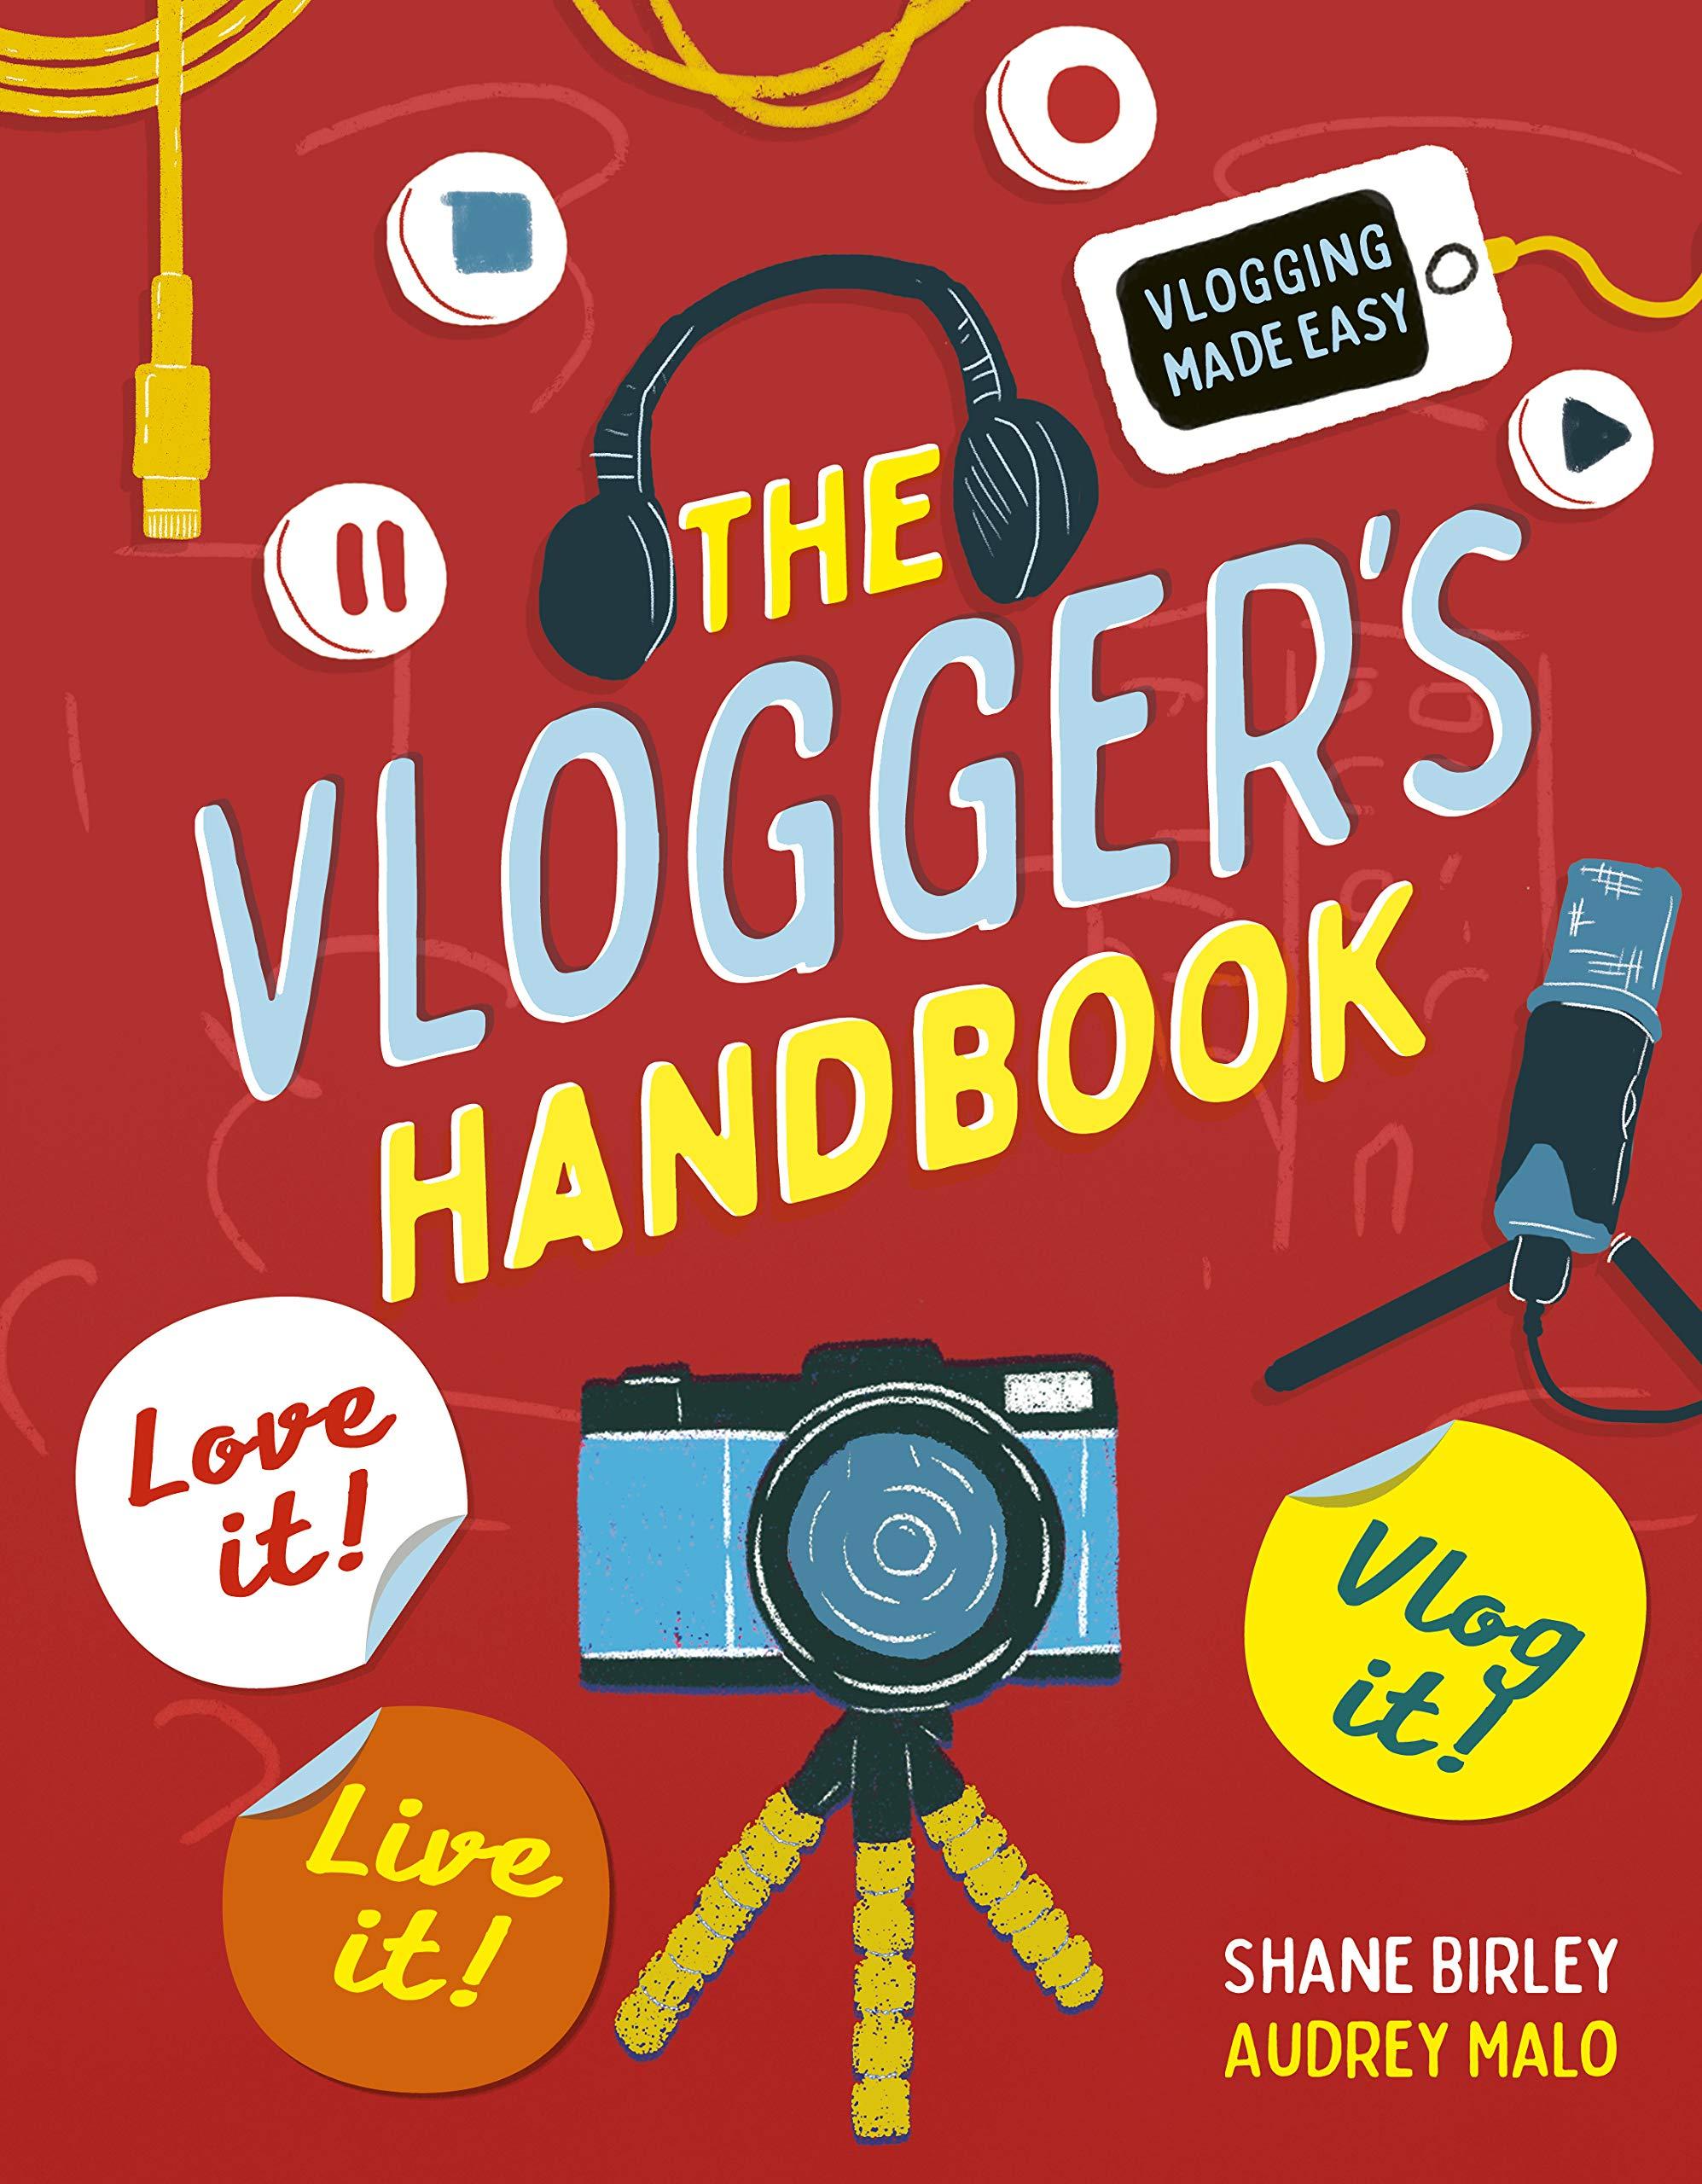 The Vlogger's Handbook (22638)